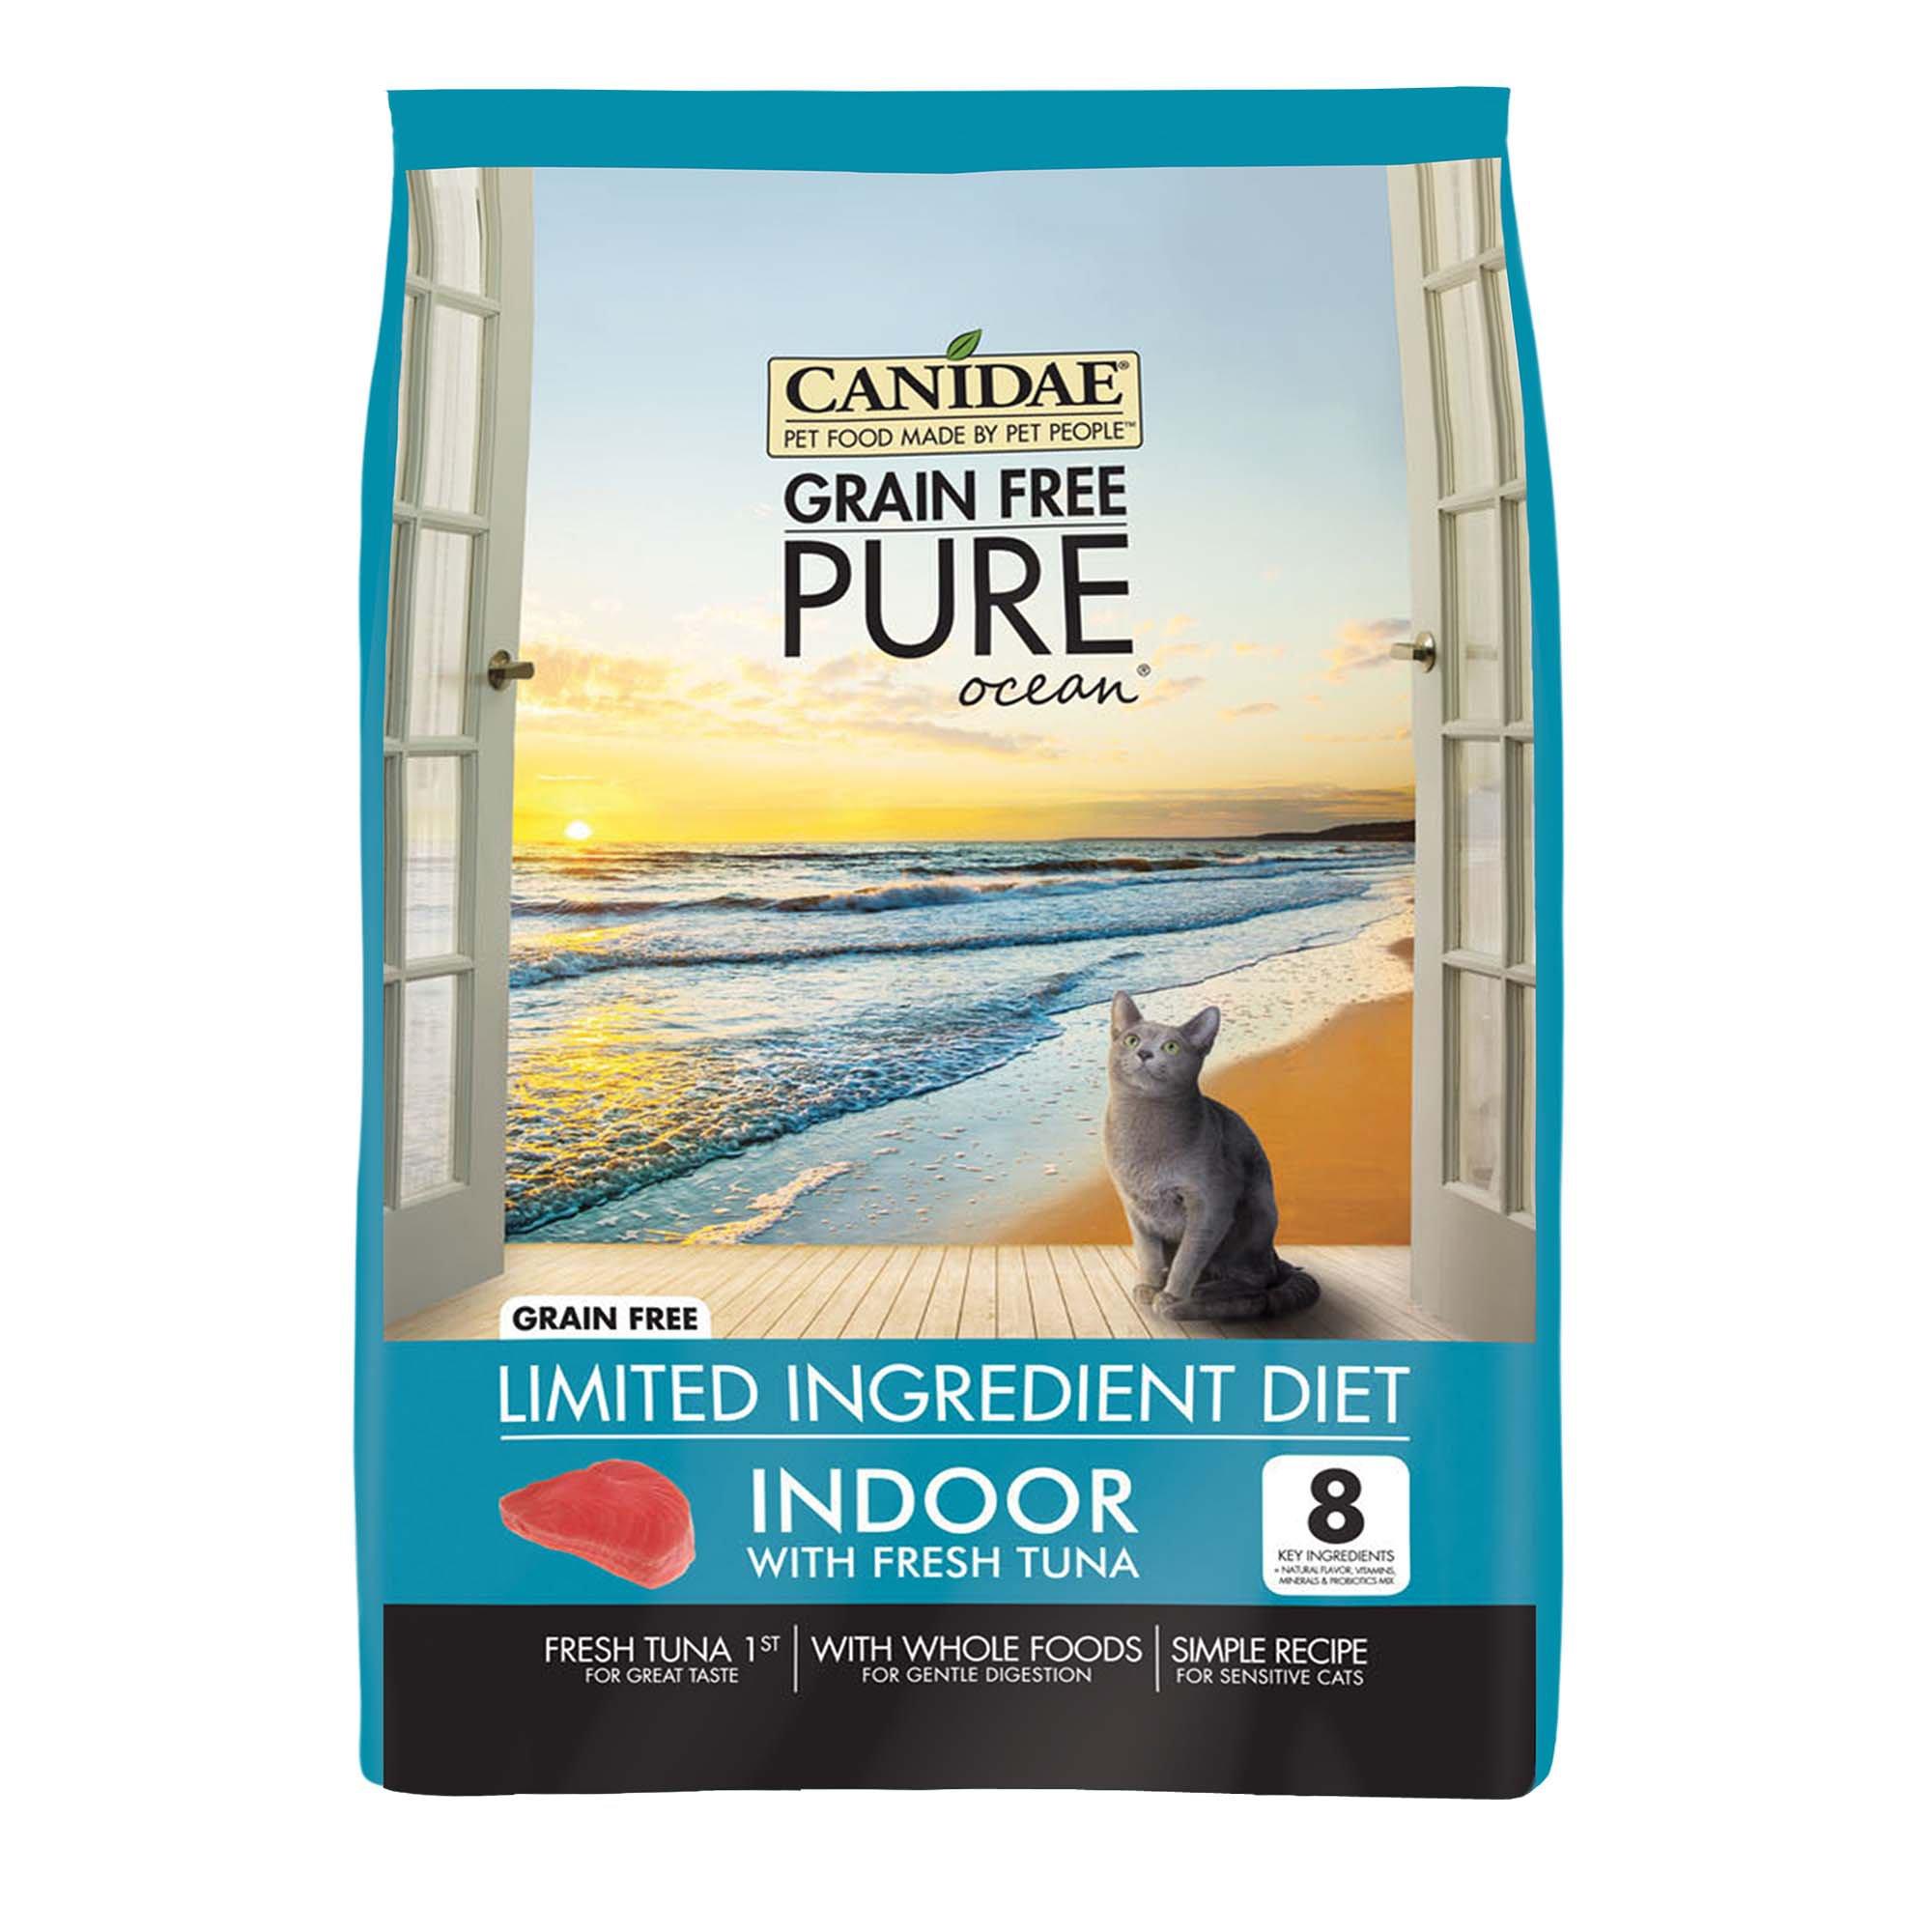 CANIDAE Grain Free PURE Ocean Indoor Cat Formula Made With Fresh Tuna